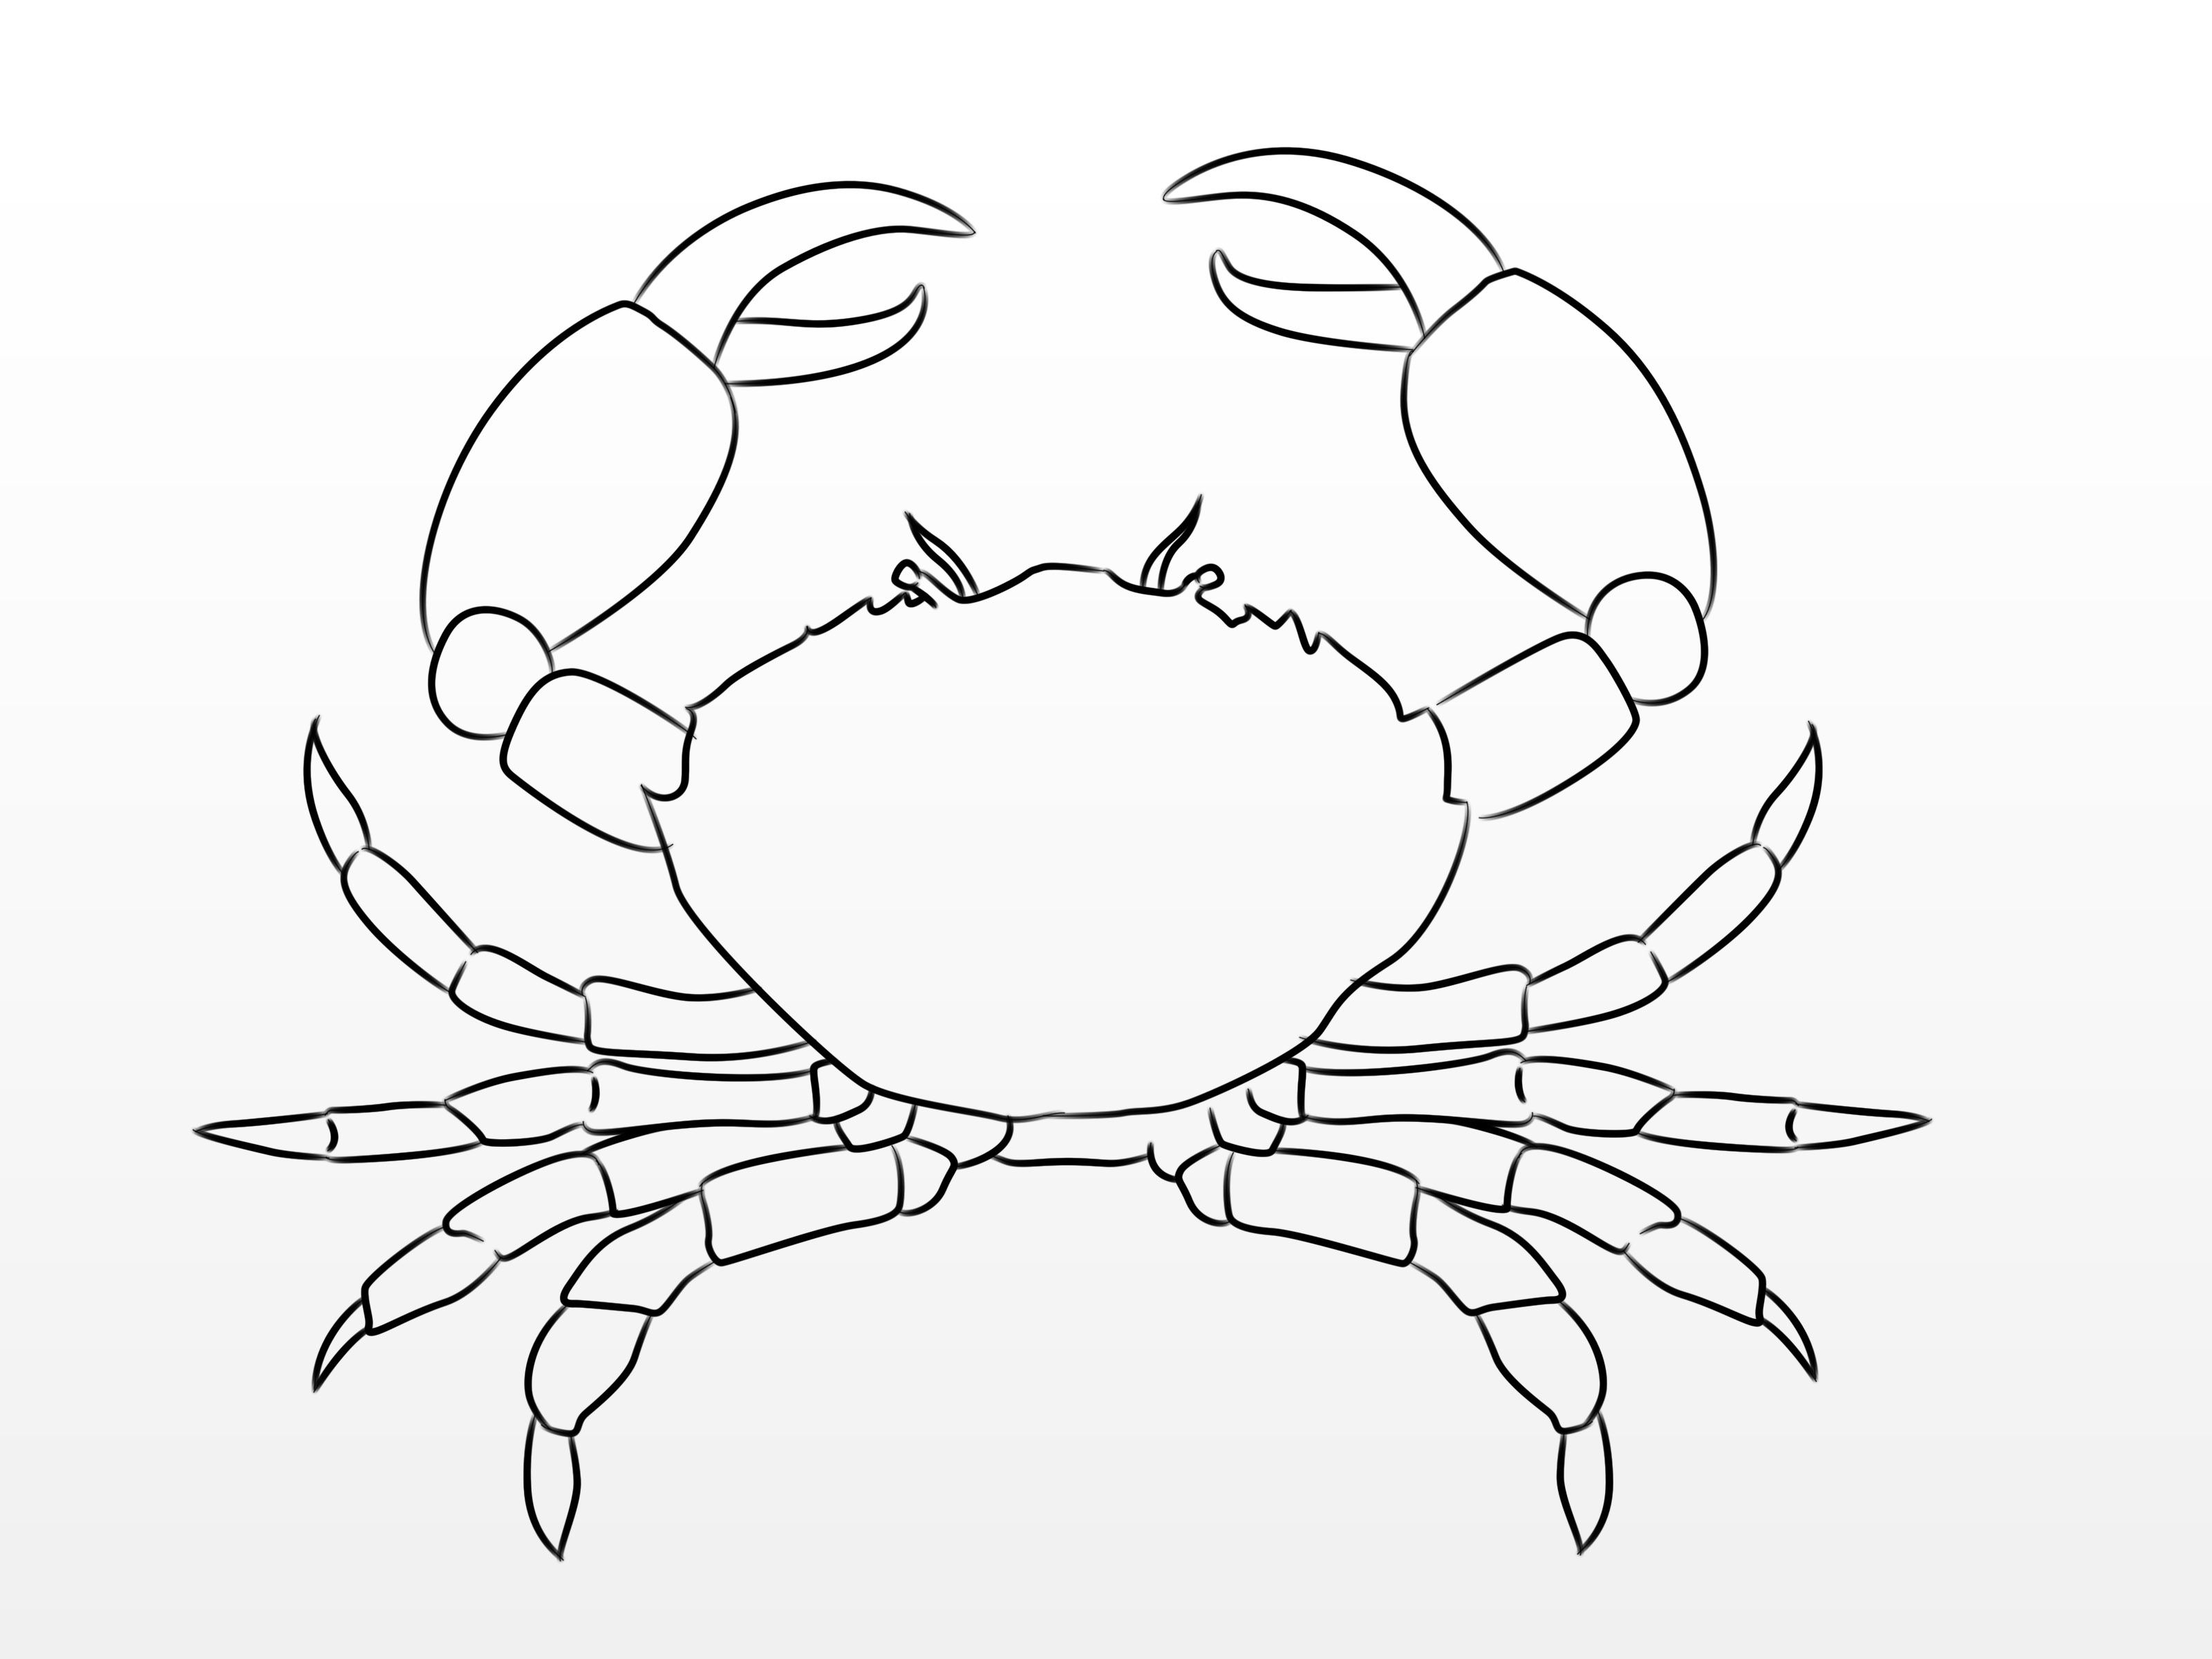 Draw a Crab Hoạt hình